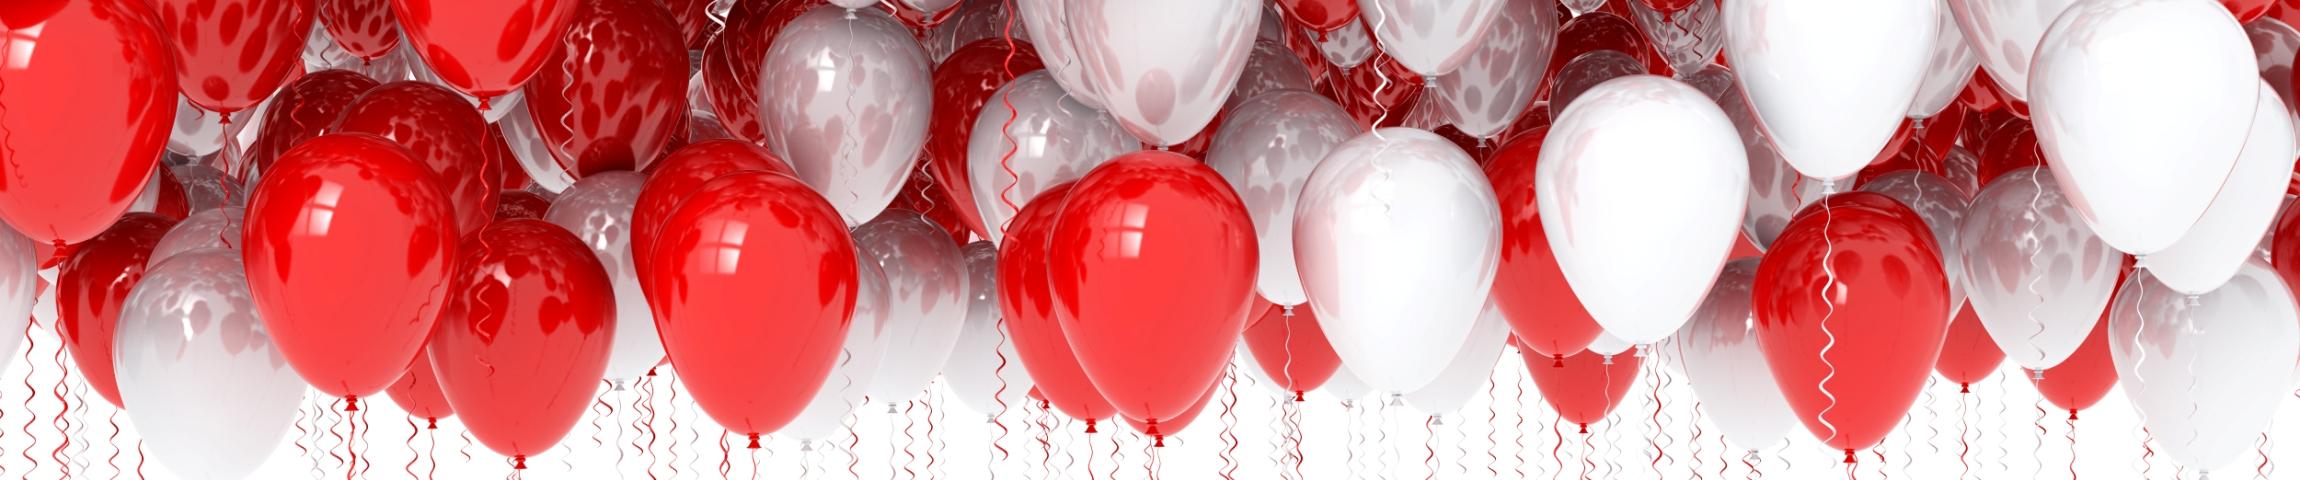 Zum Abheben: Unsere Ballons